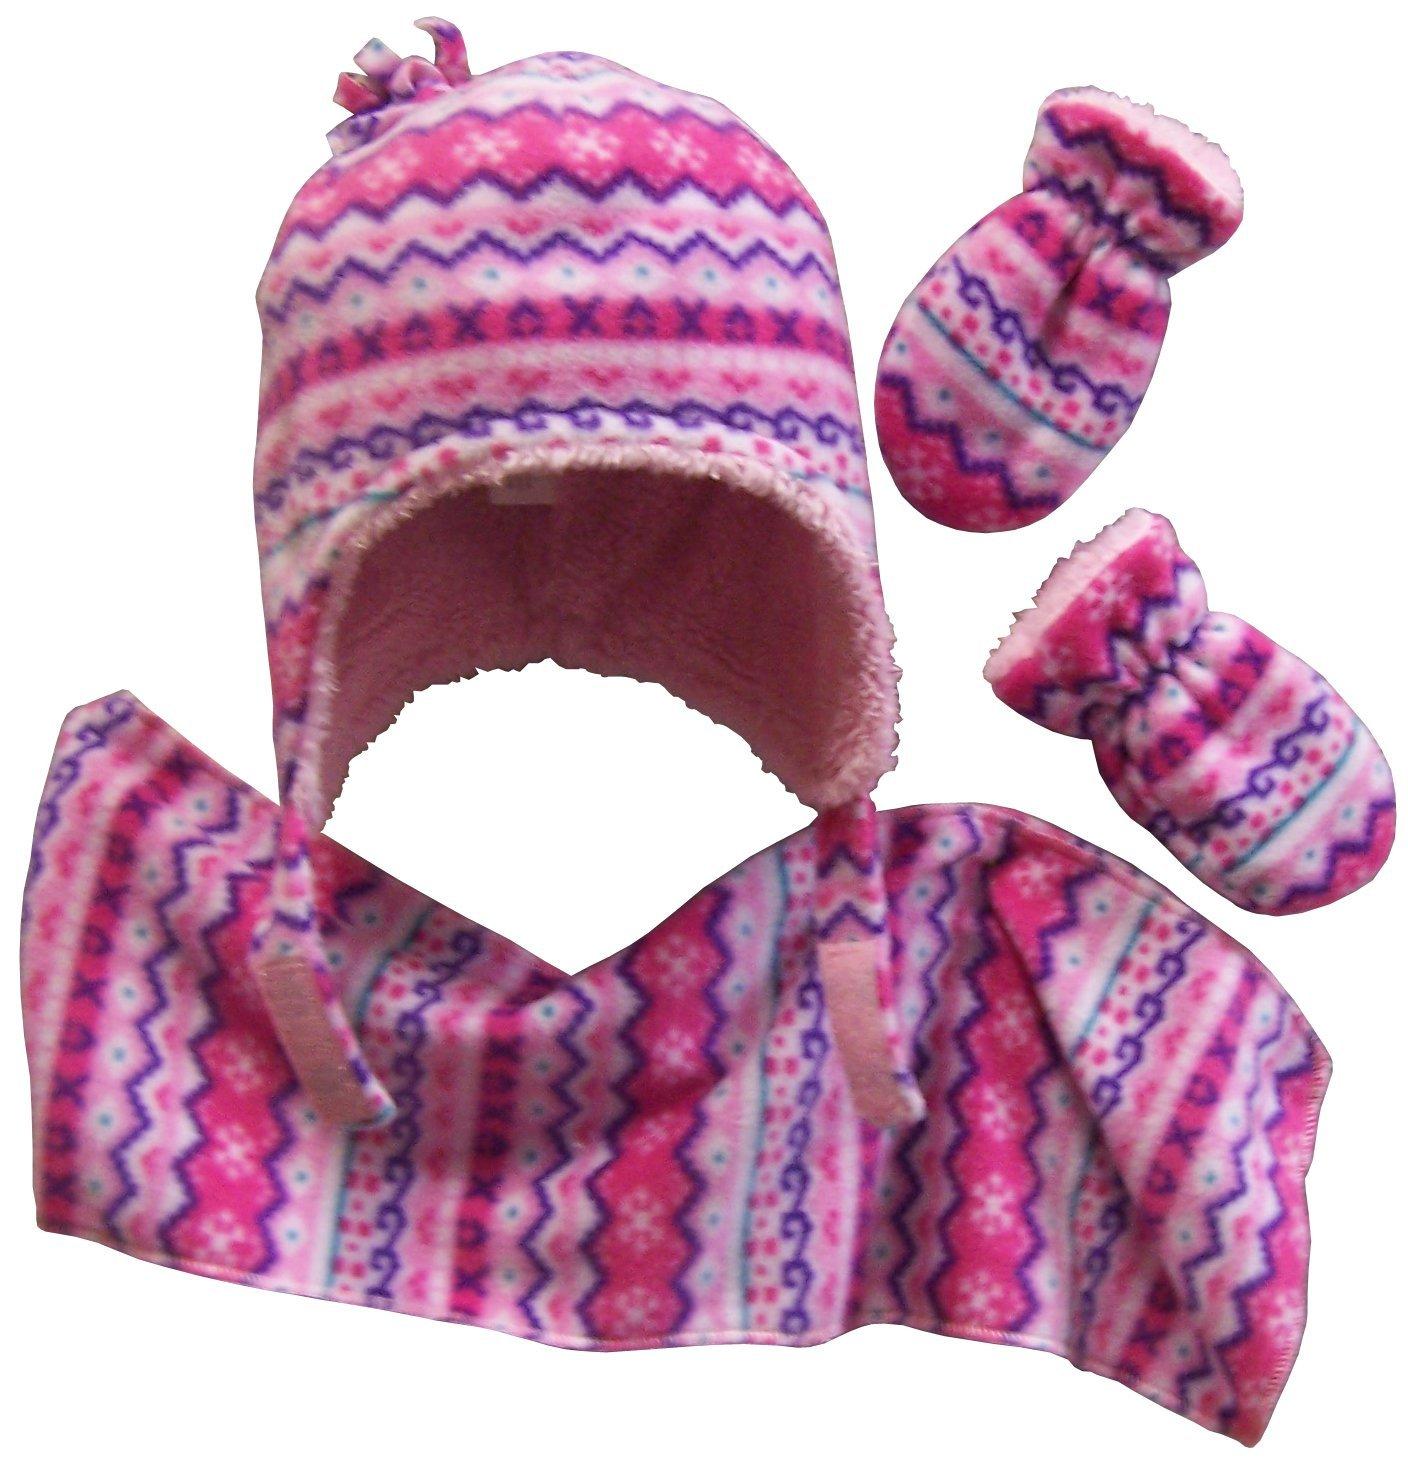 N'Ice Caps Girls and Baby Fair Isle Print Fleece Hat/Scarf/Mitten Set 2881-FR